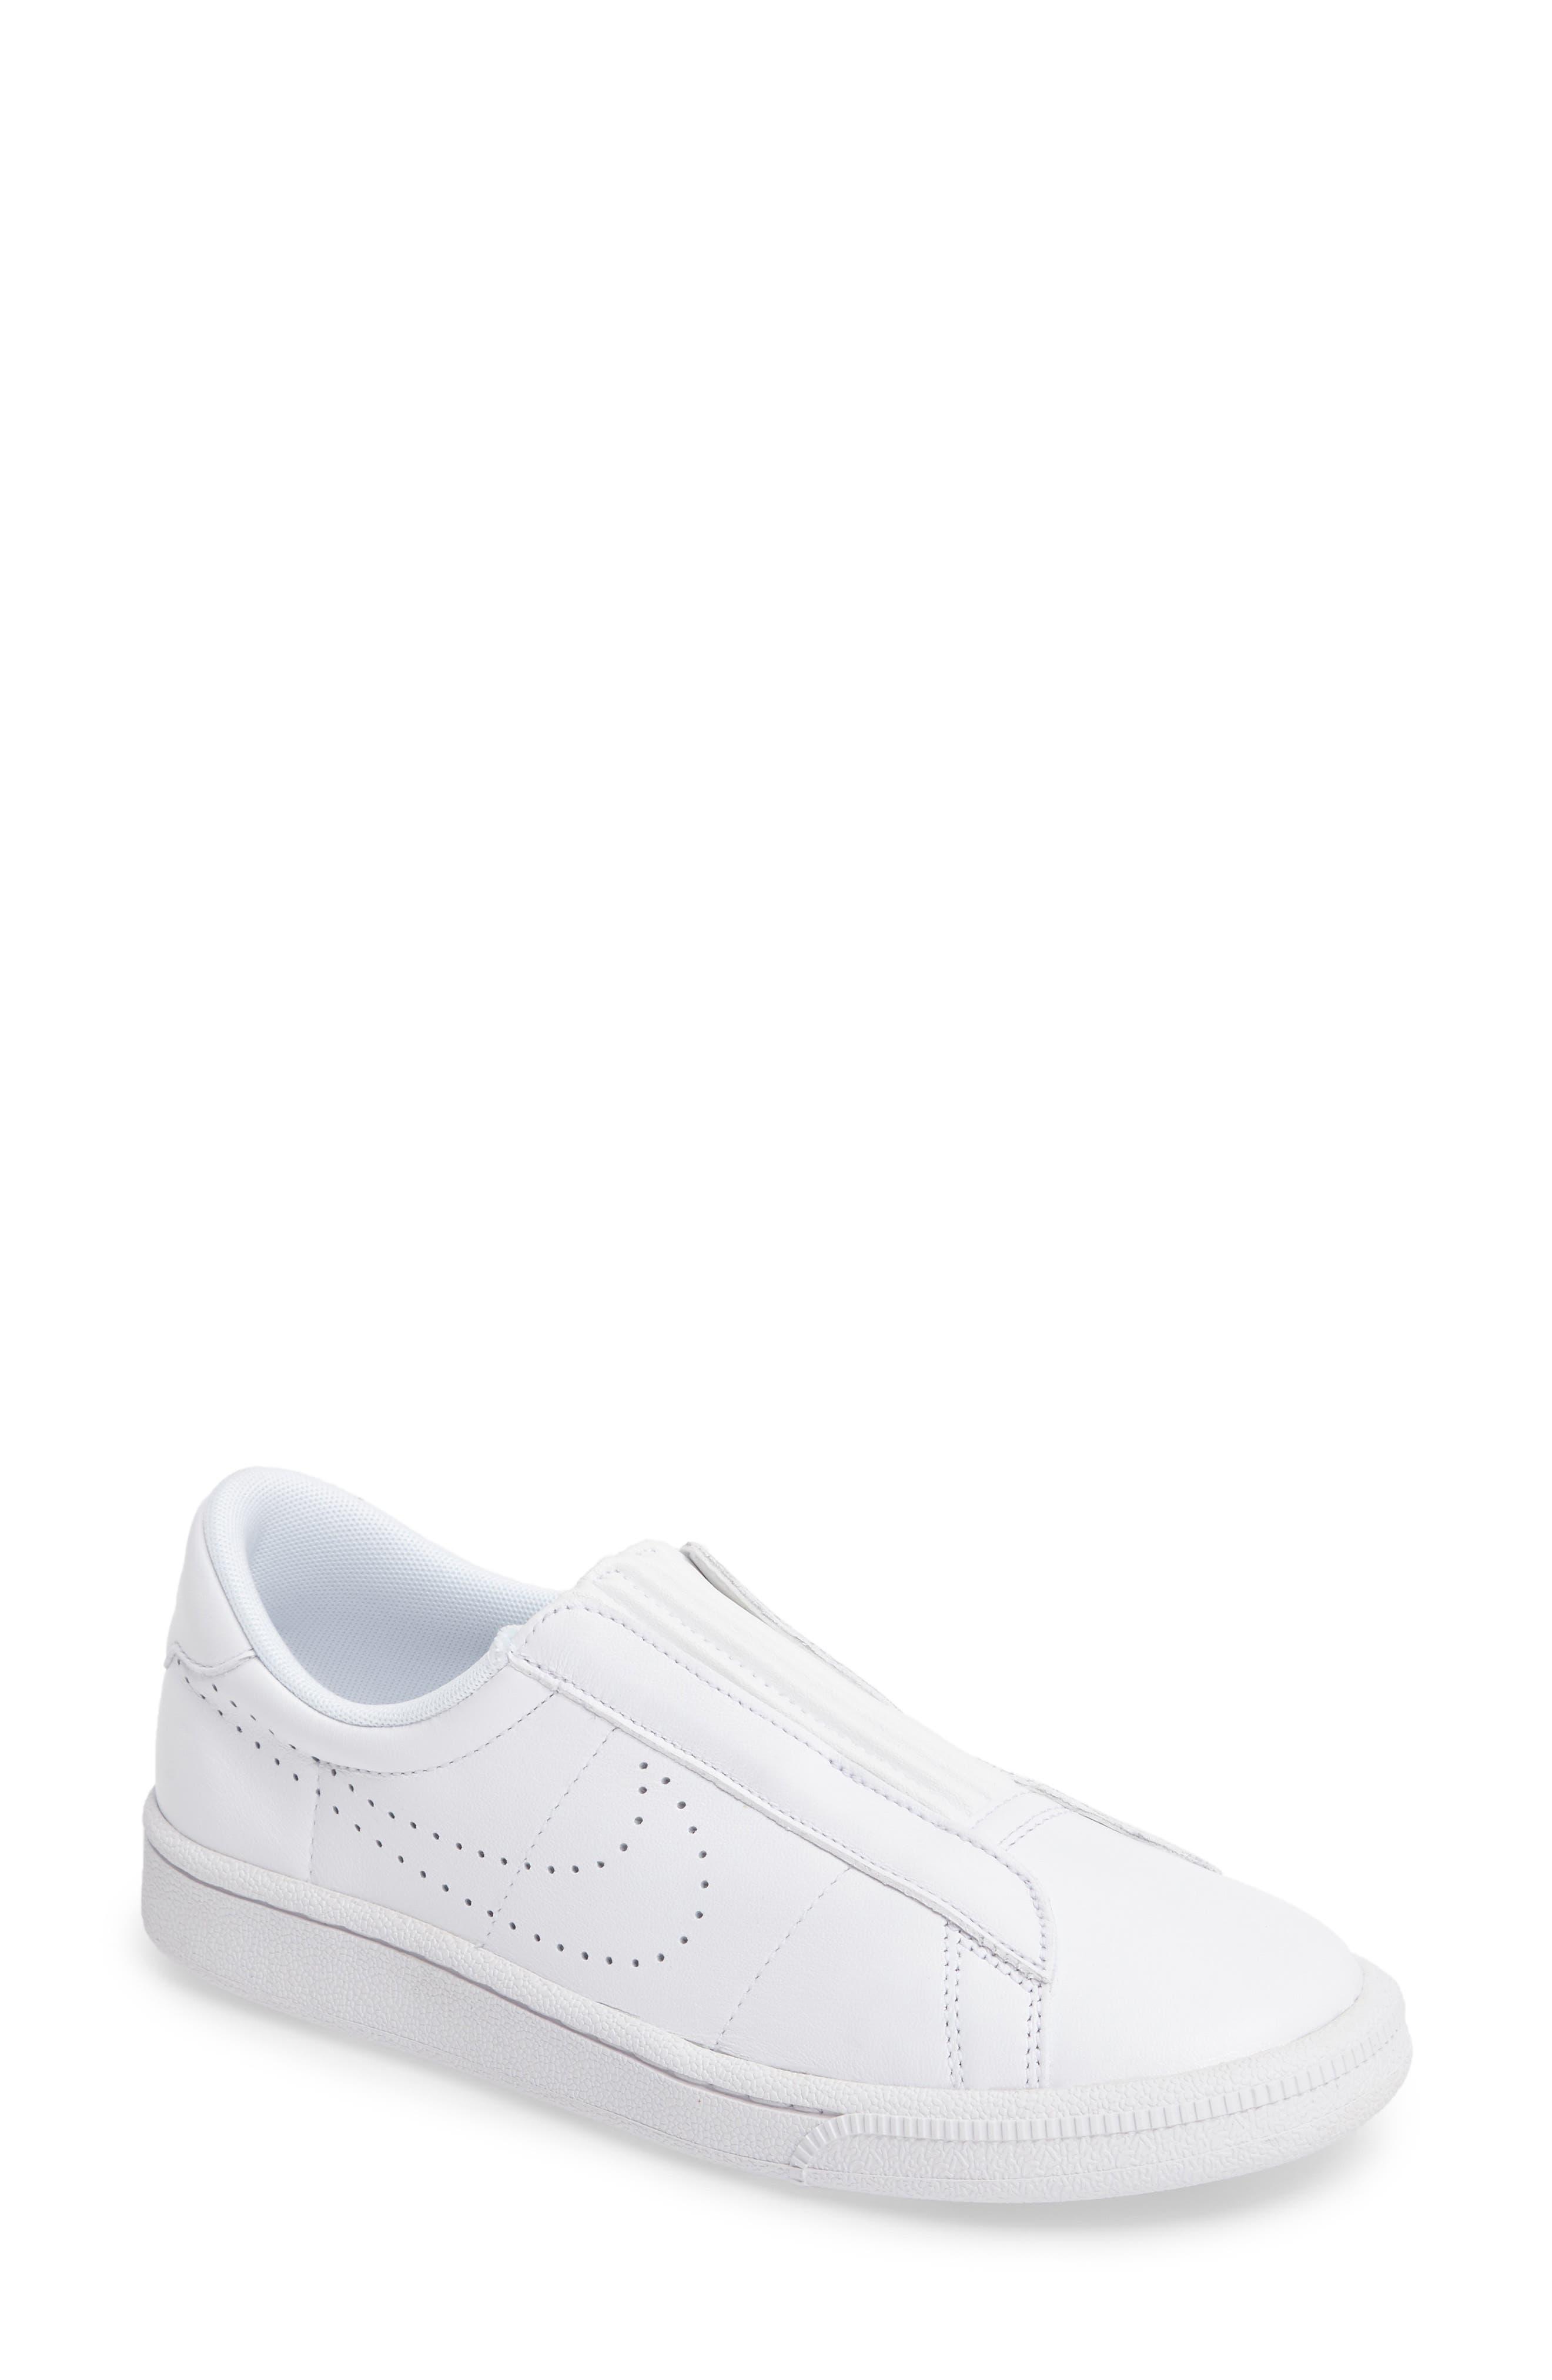 Classic EZ Slip-On Tennis Shoe,                         Main,                         color, White/ White/ Black